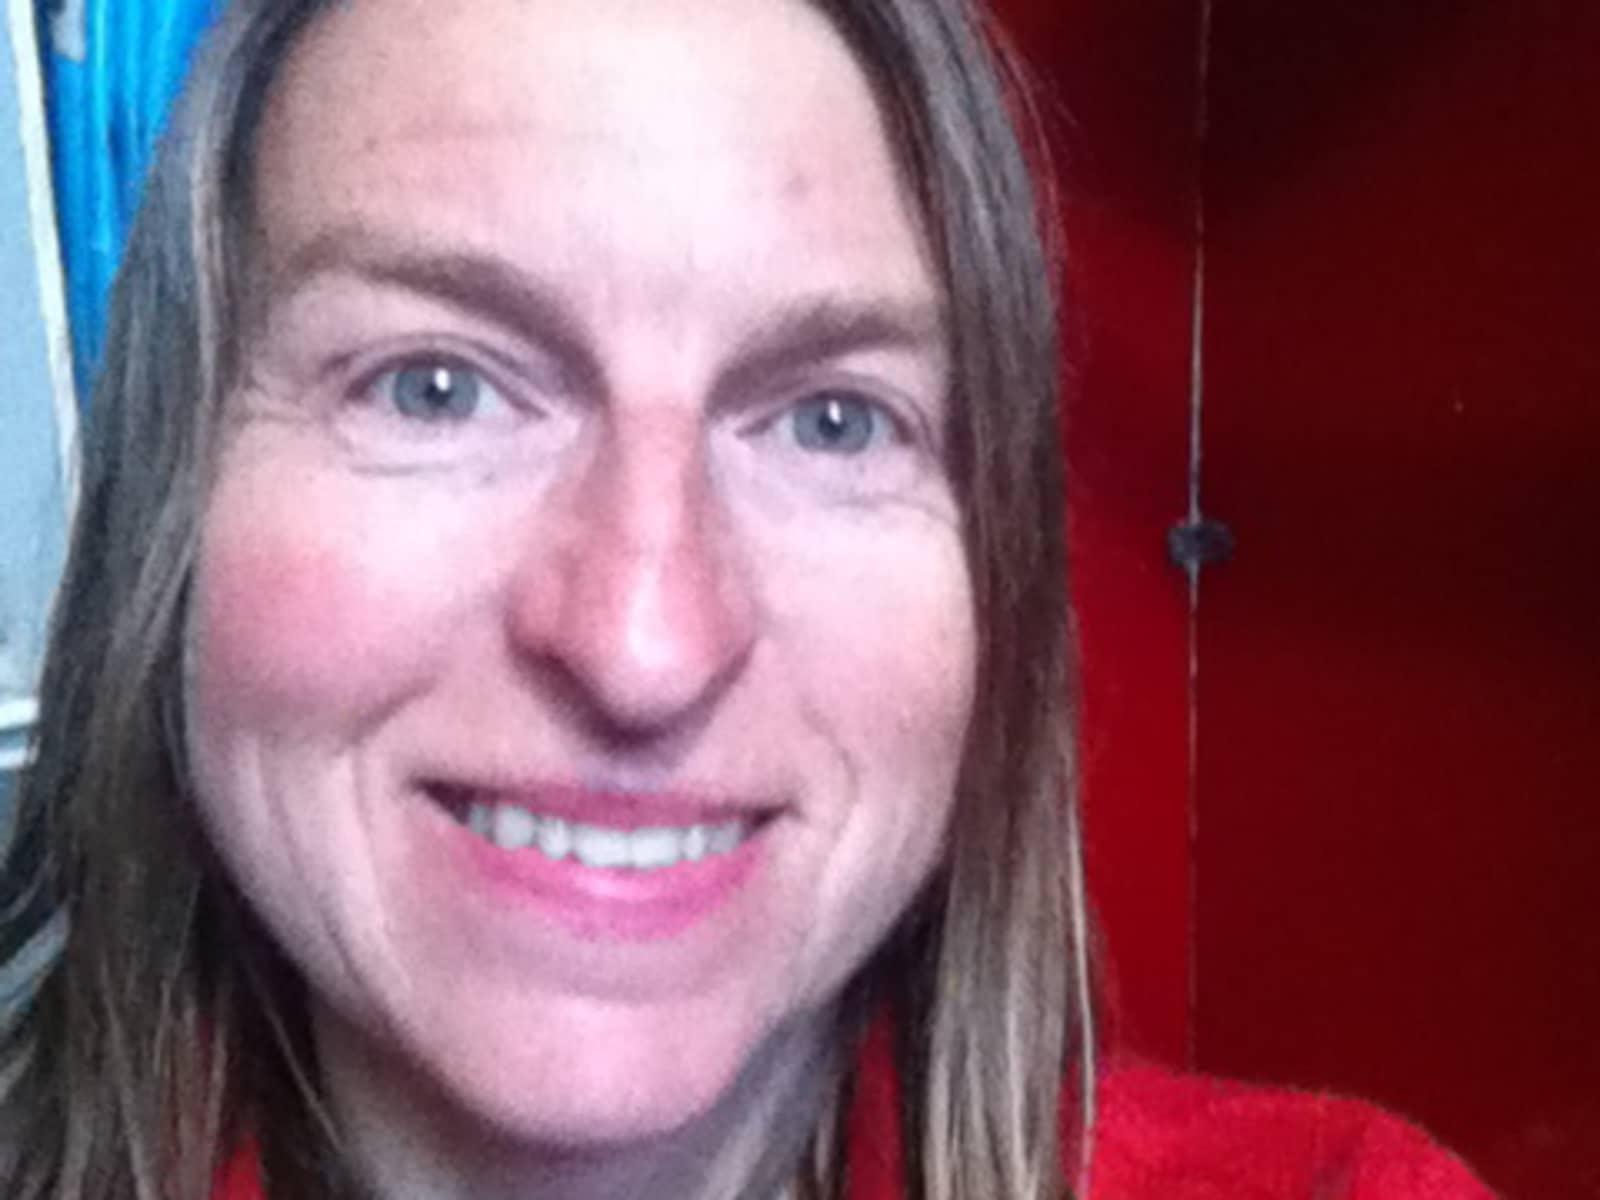 Yvonne from Brighton, United Kingdom